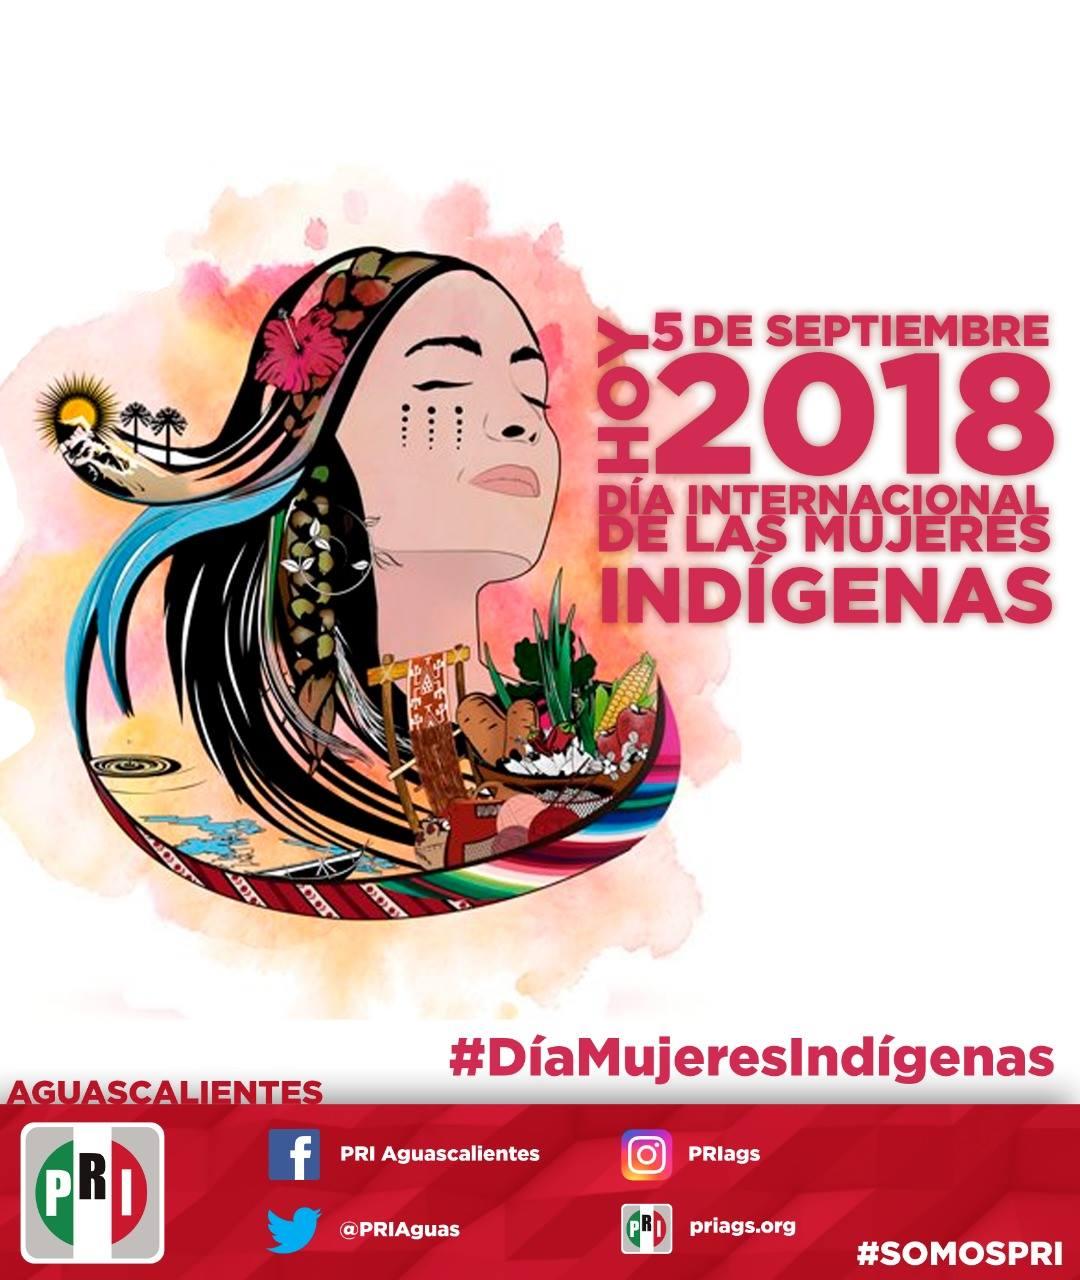 #DíaDeLaMujerIndígena